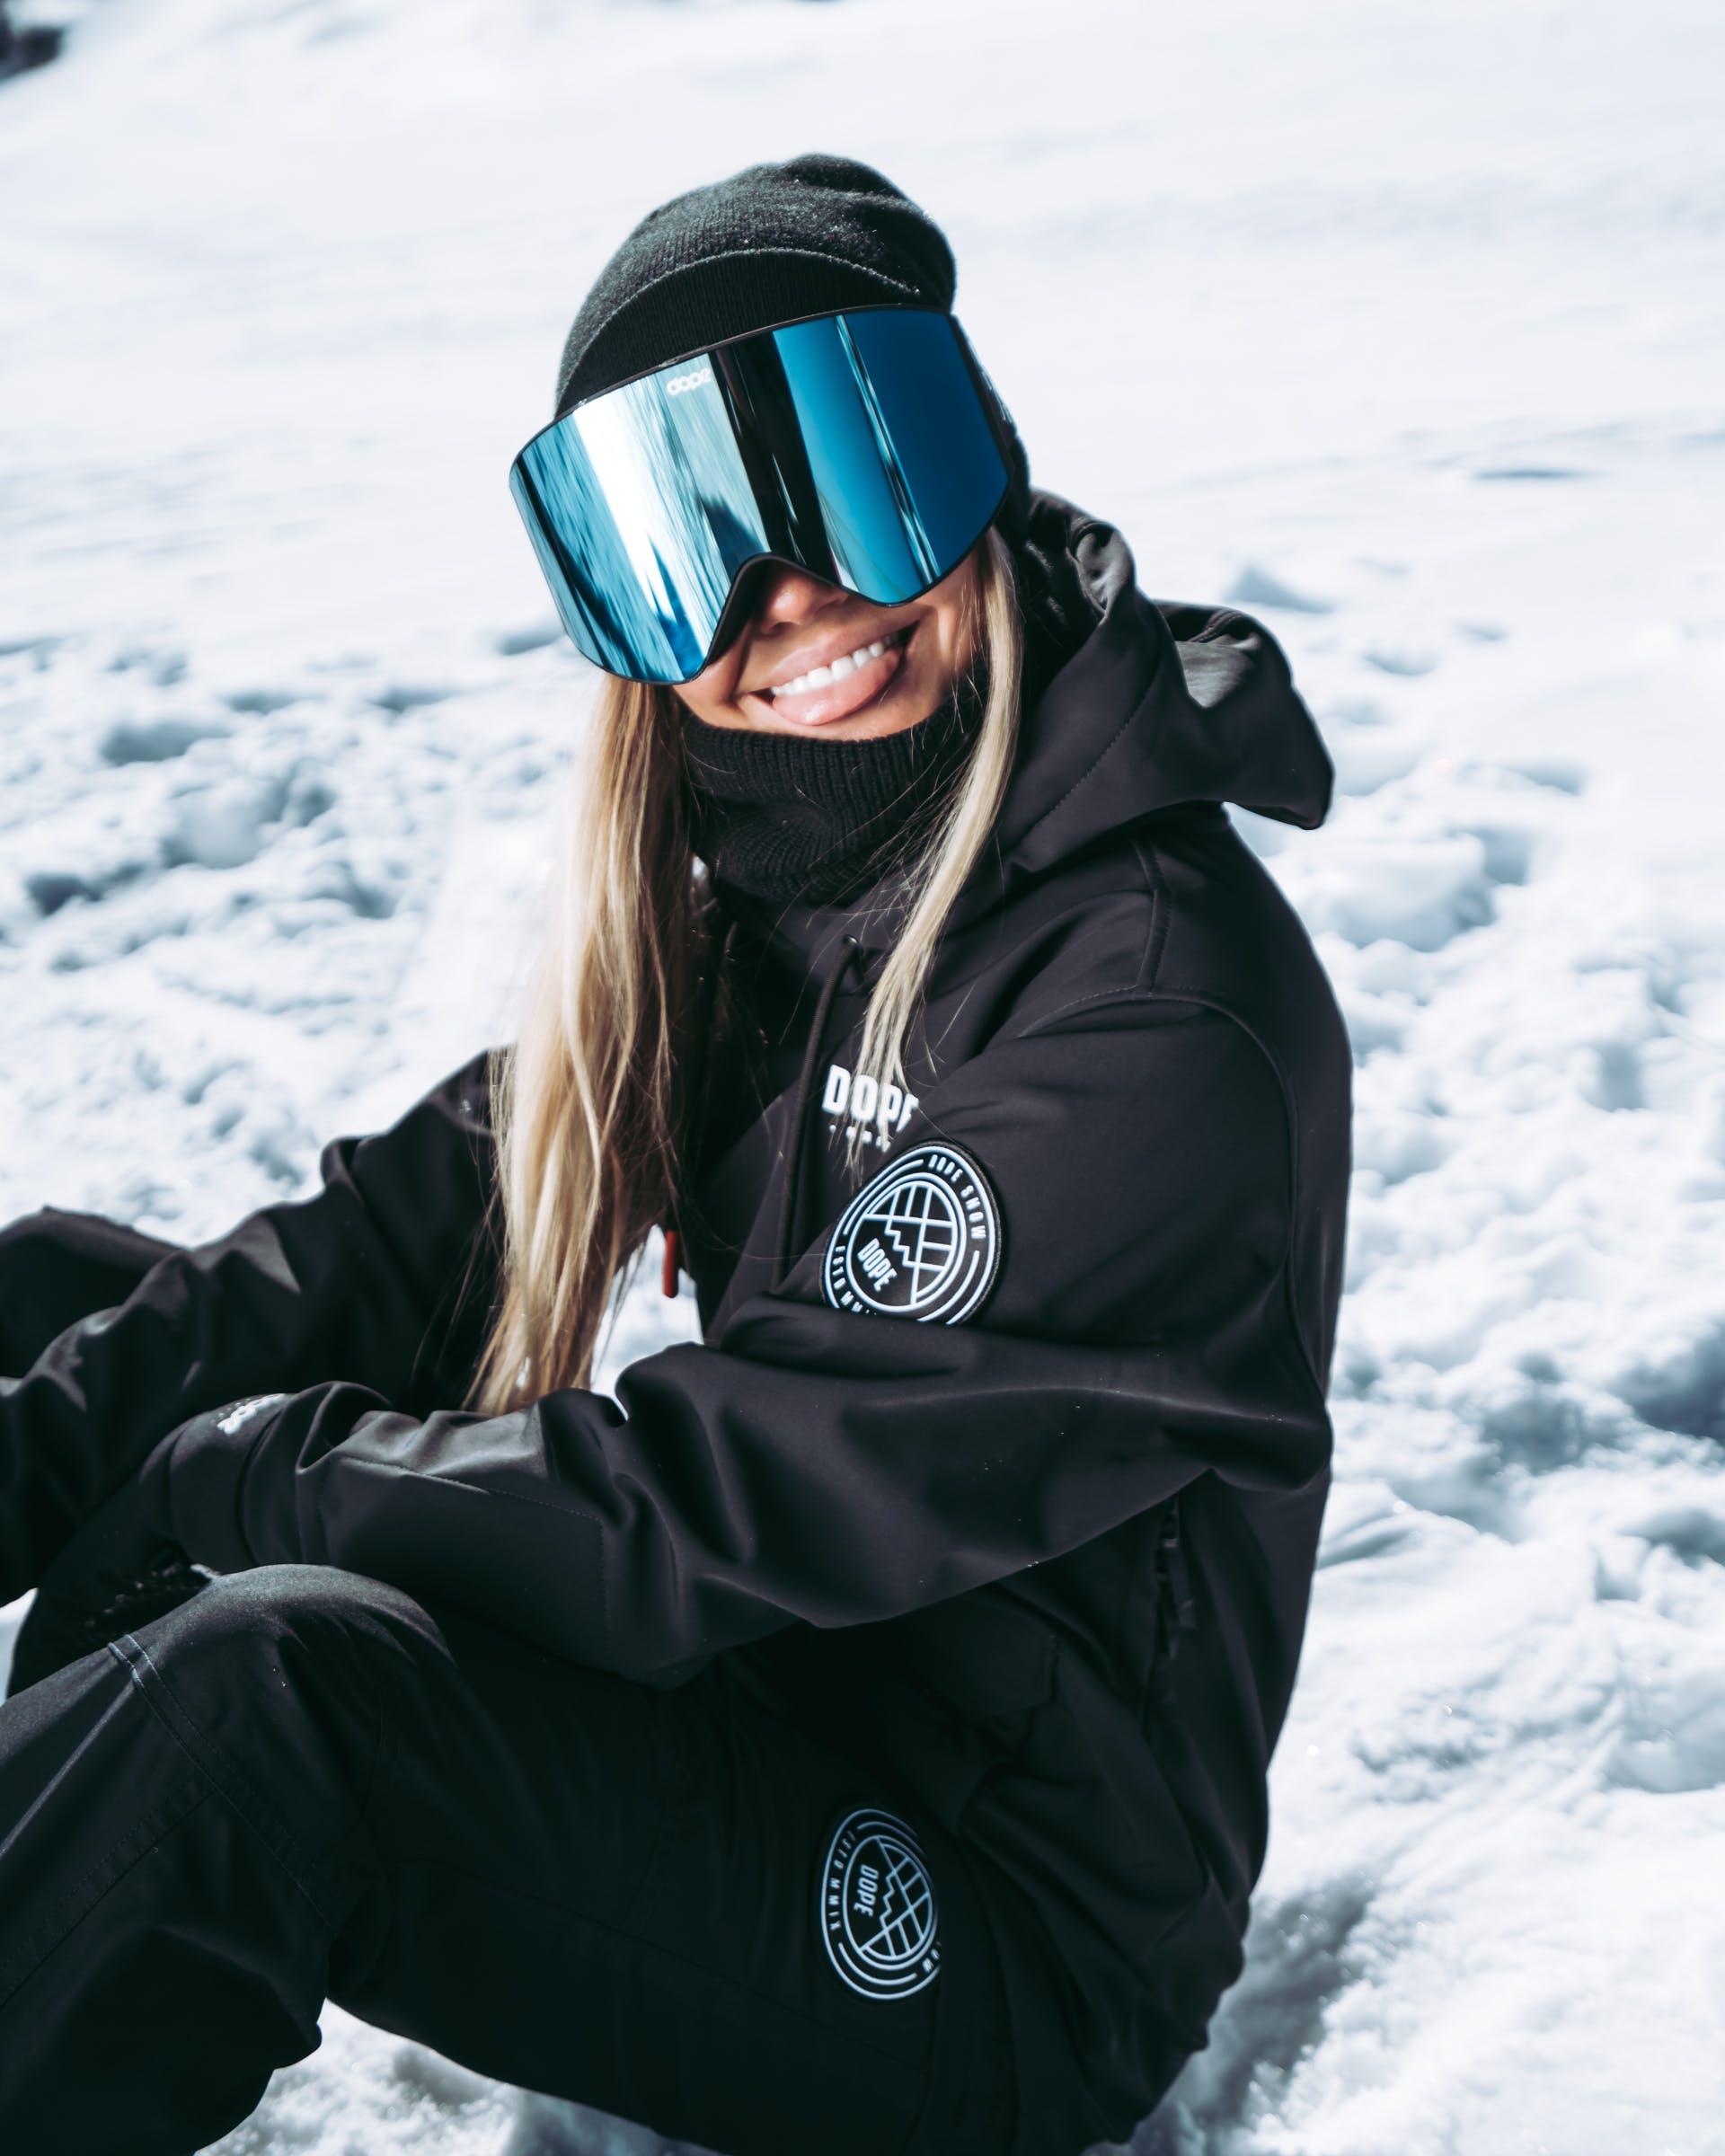 injuries while snowboaring